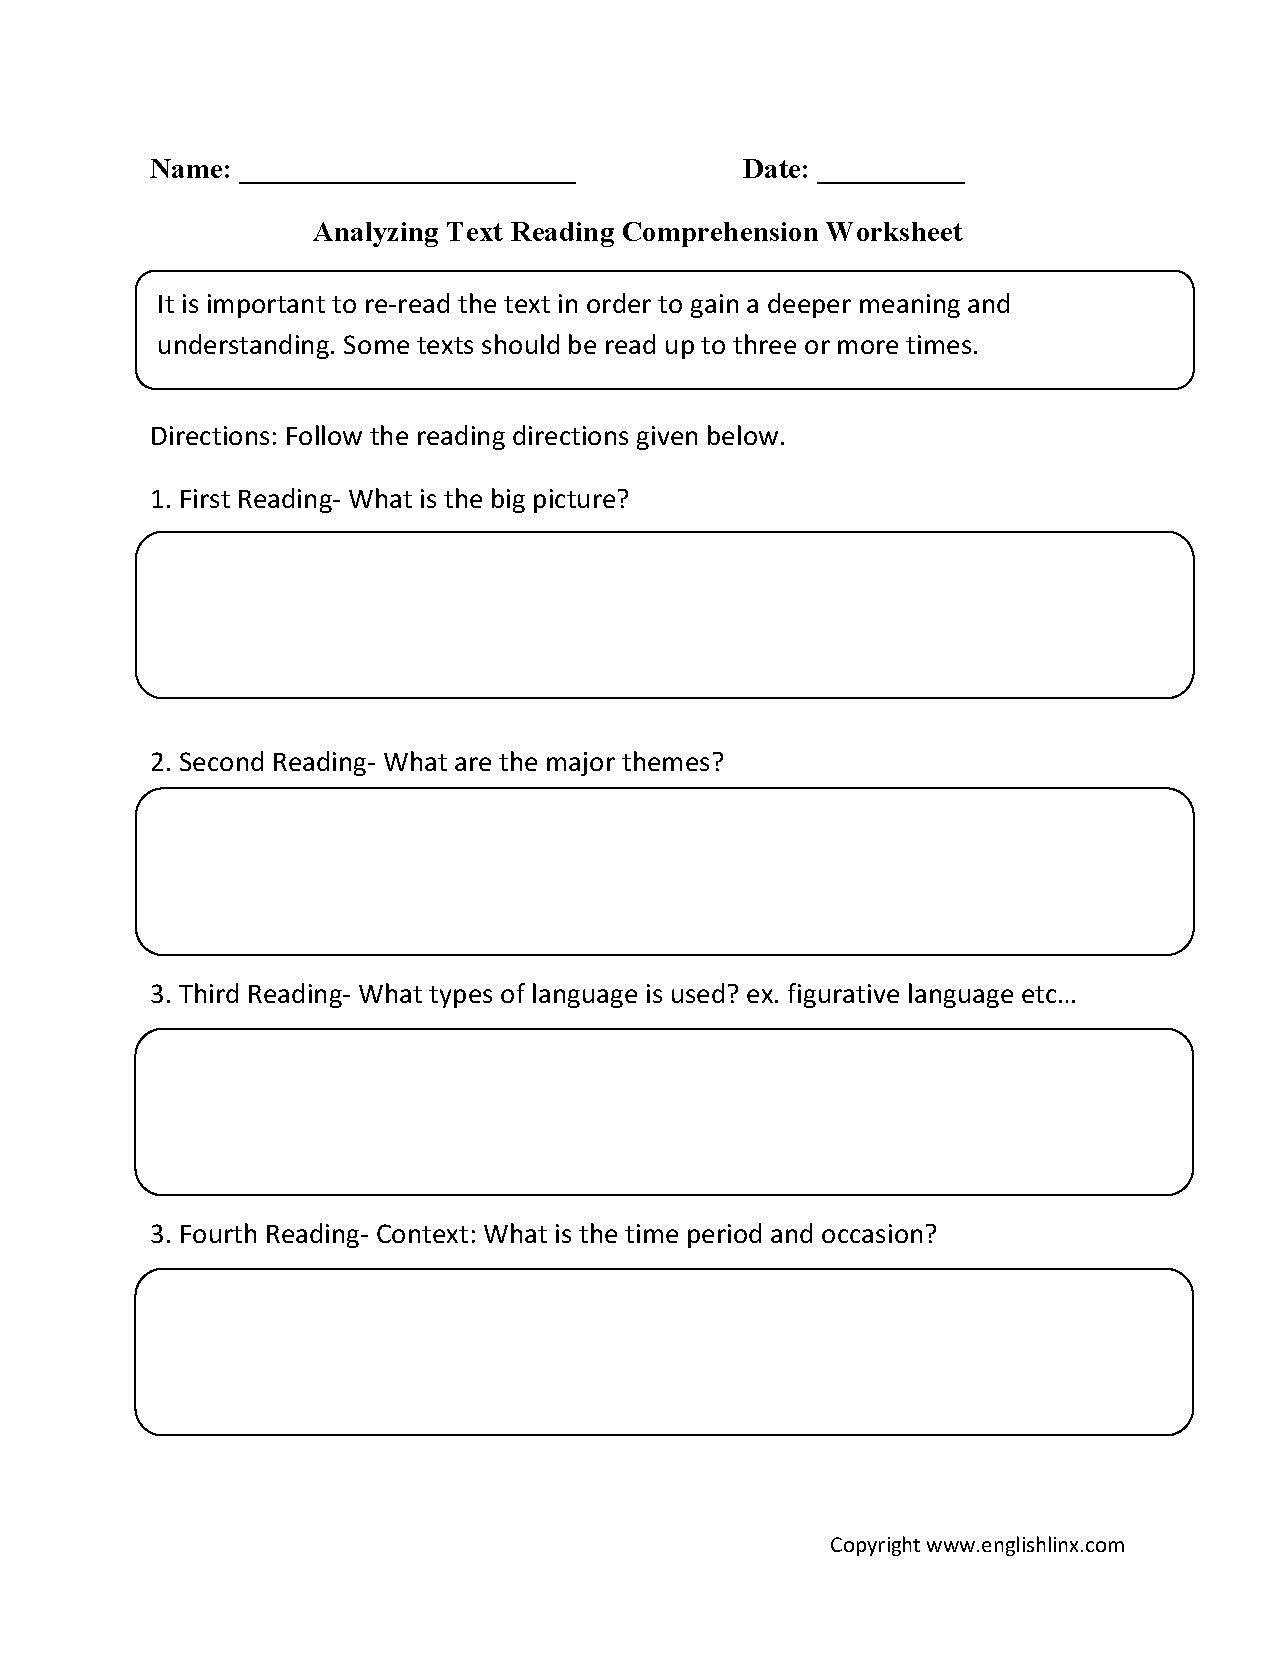 Reading Prehension Worksheets